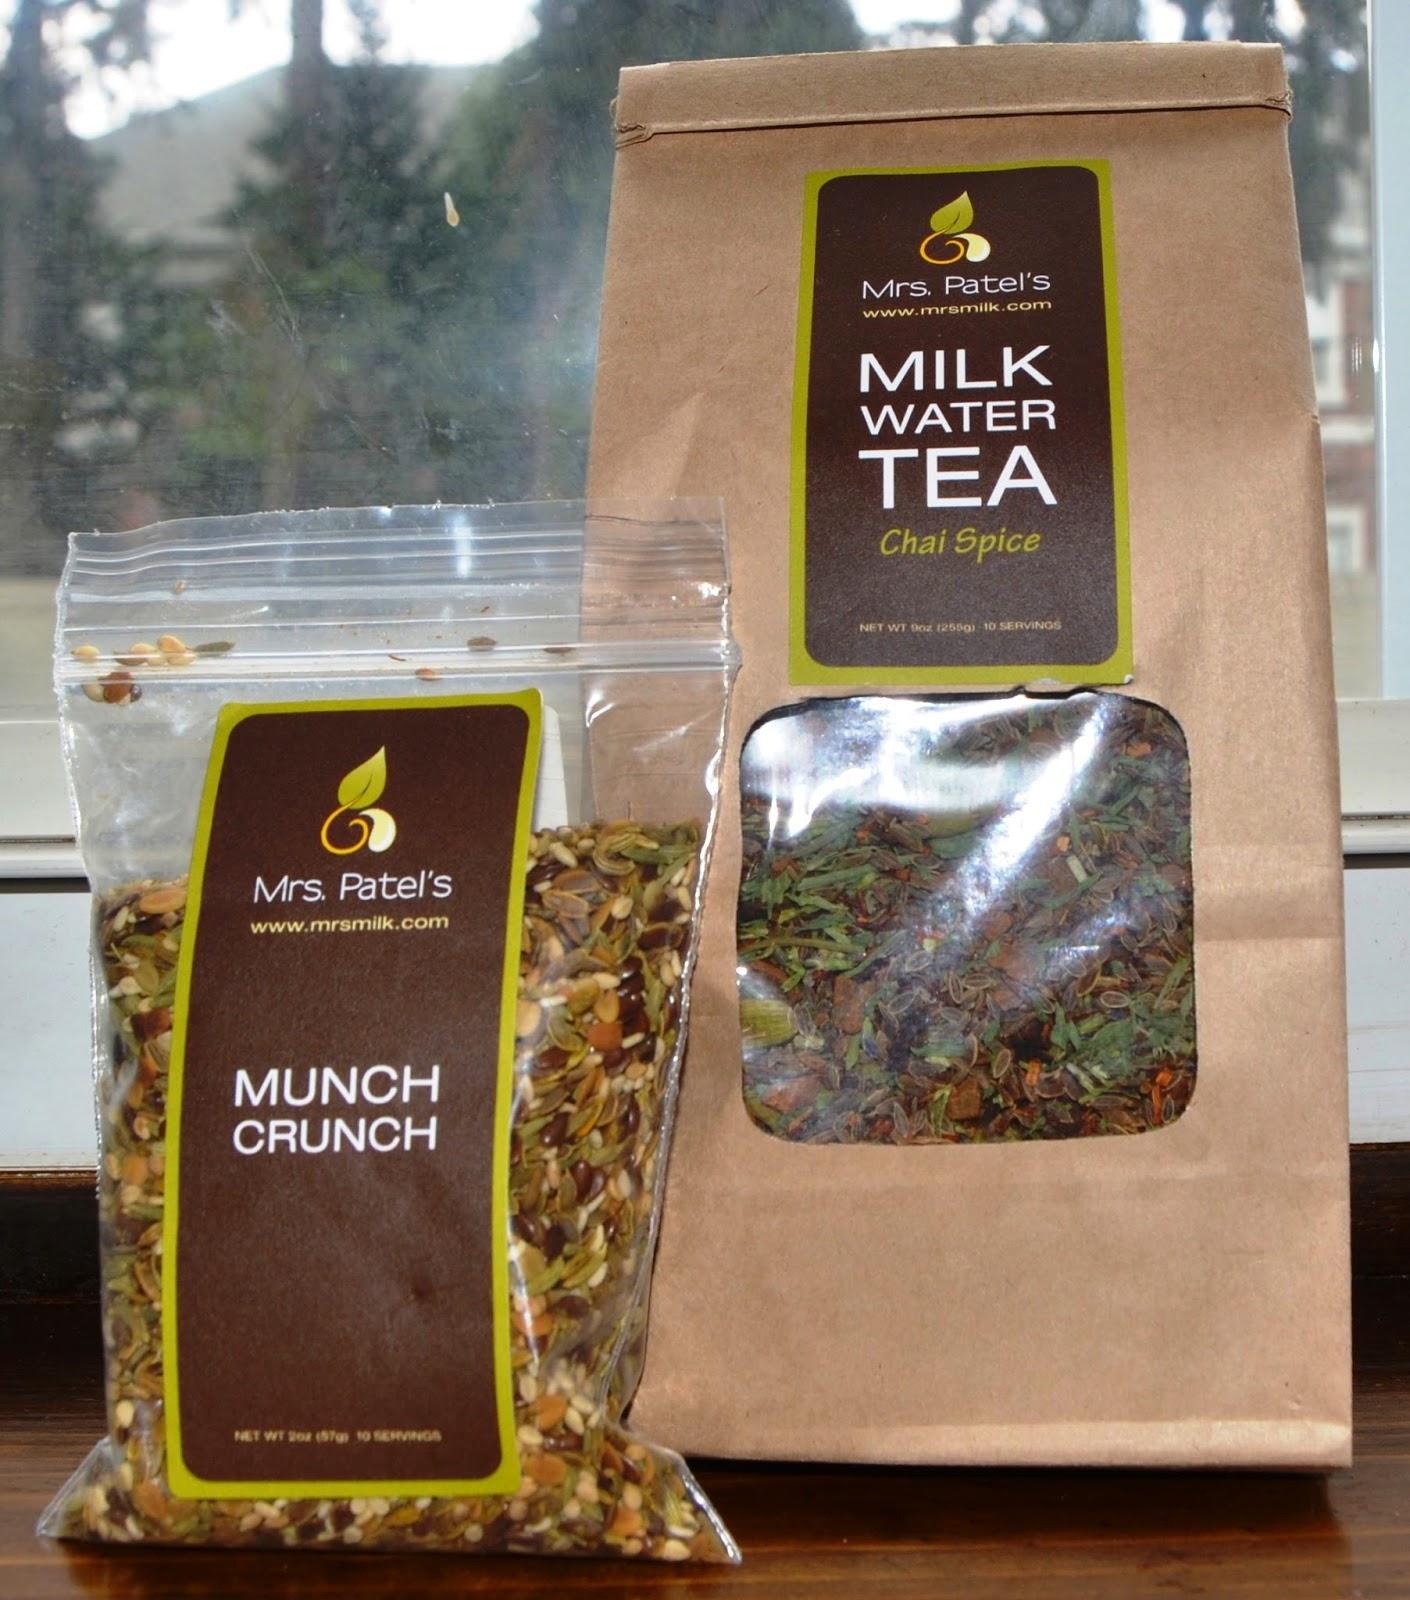 Mrs. Patel's Milk Boosting products